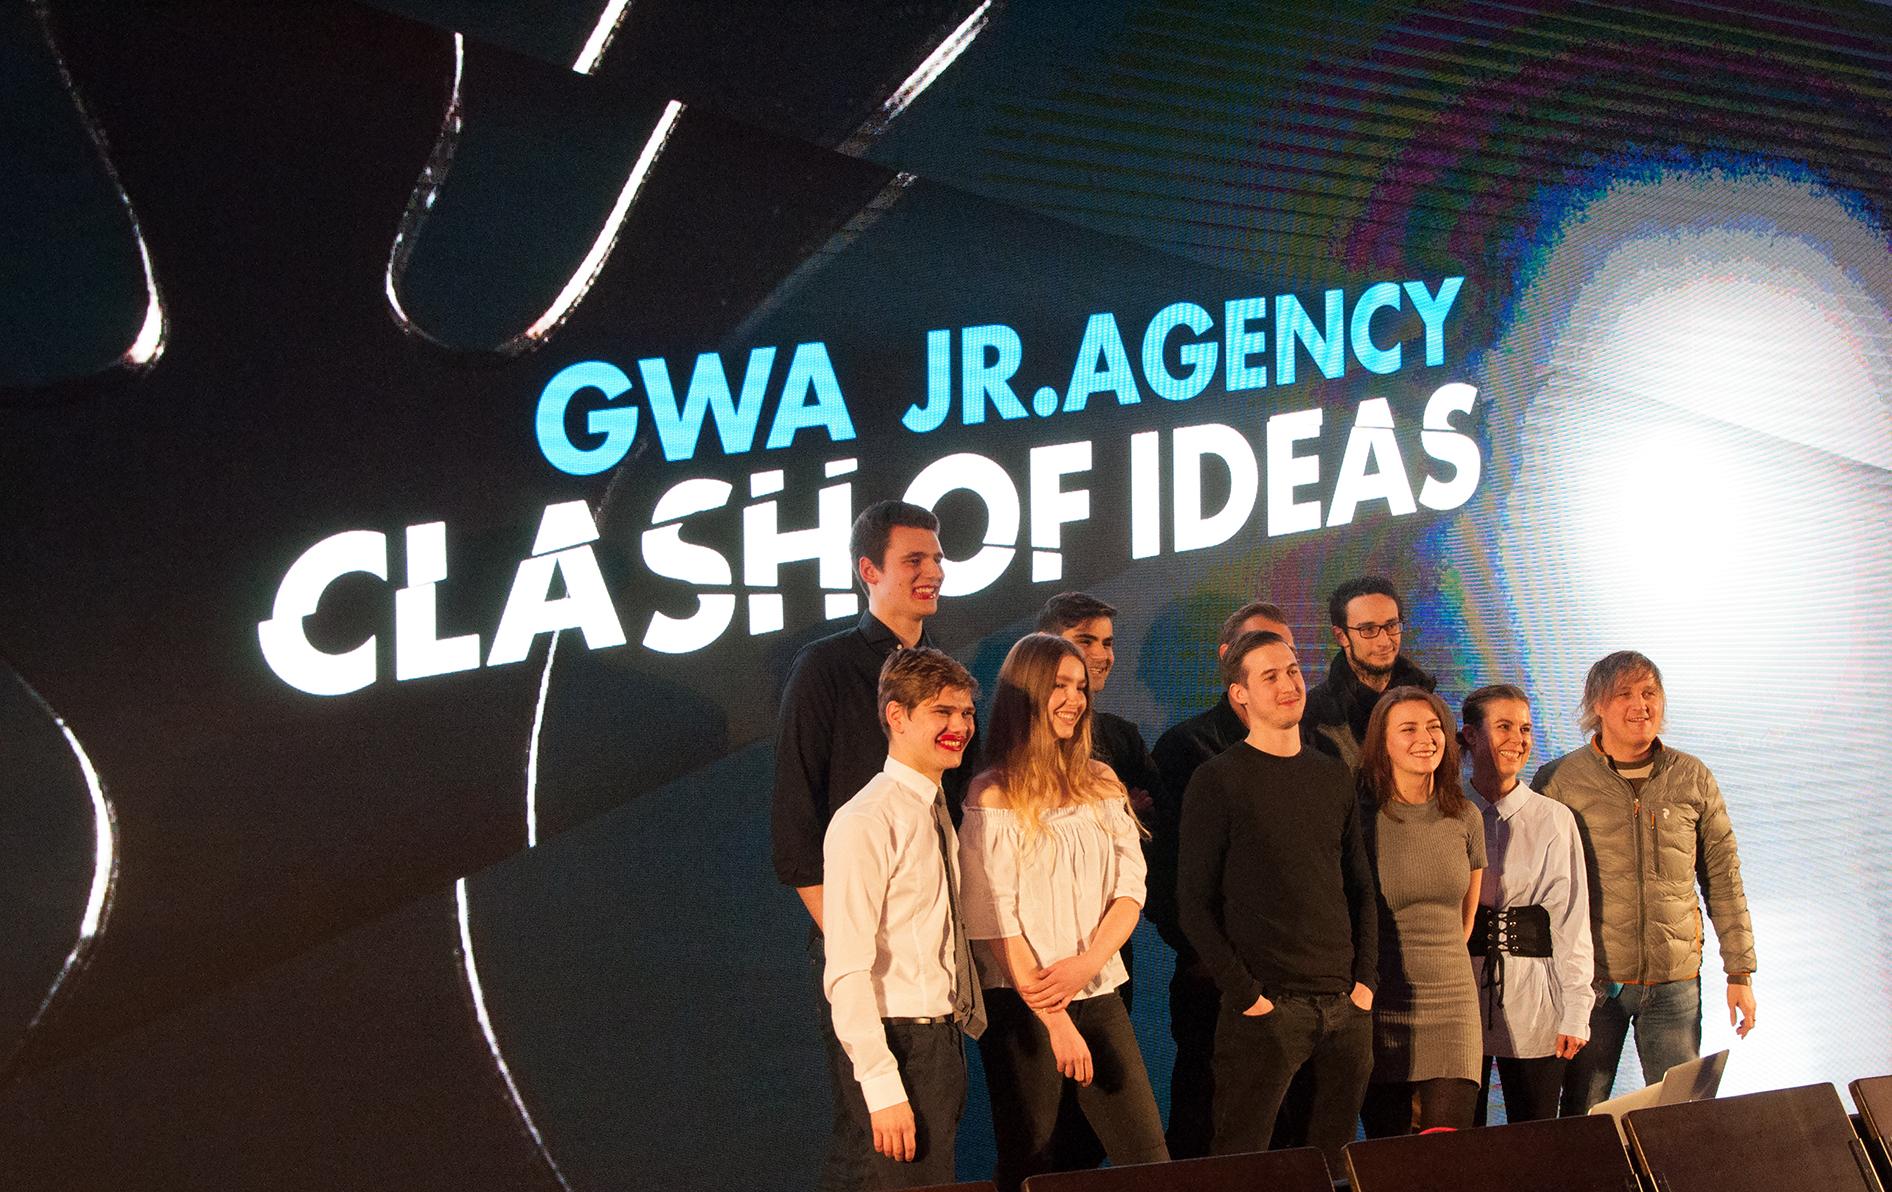 HS-Niederrhein-Sieger-GWA-Junior-Agency-Award